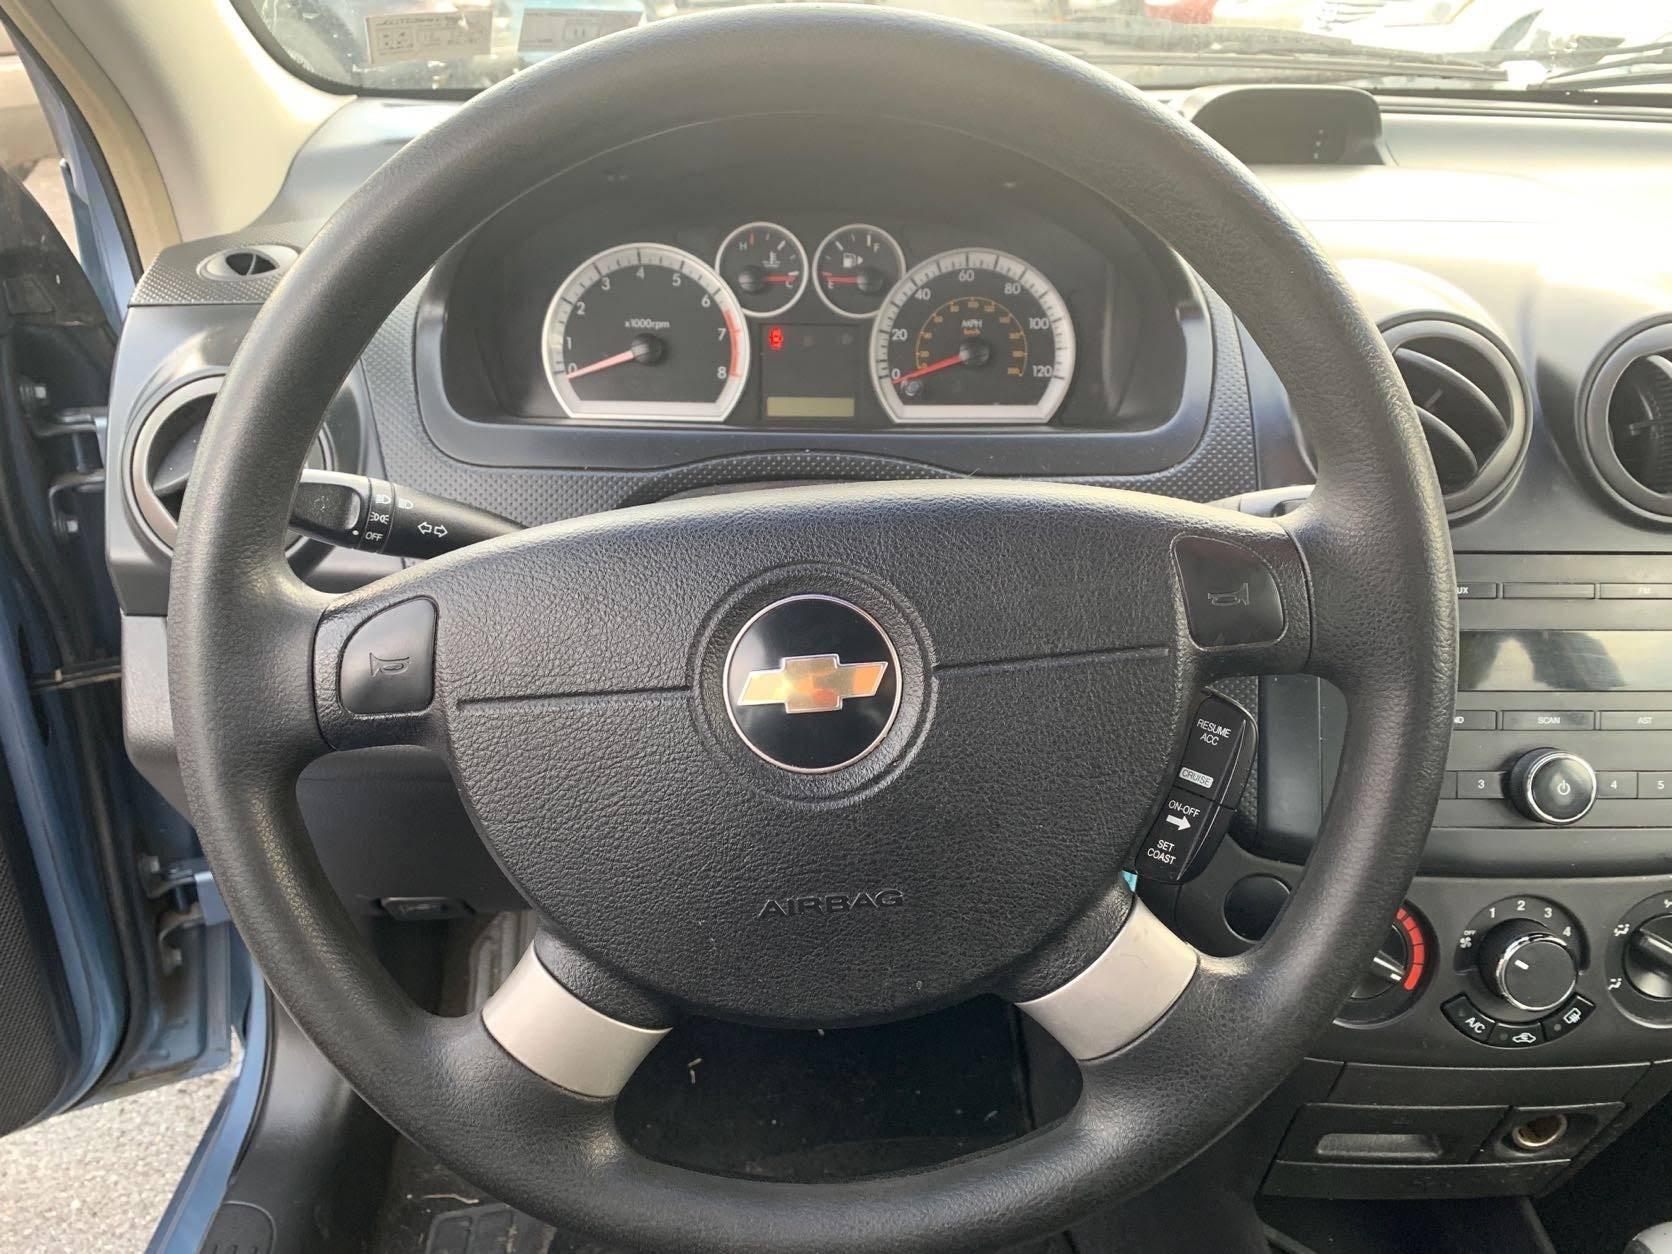 2007 chevrolet aveo ls fuel filter 2007 chevrolet aveo 4dr sdn ls persing auto inc dealership in  2007 chevrolet aveo 4dr sdn ls persing